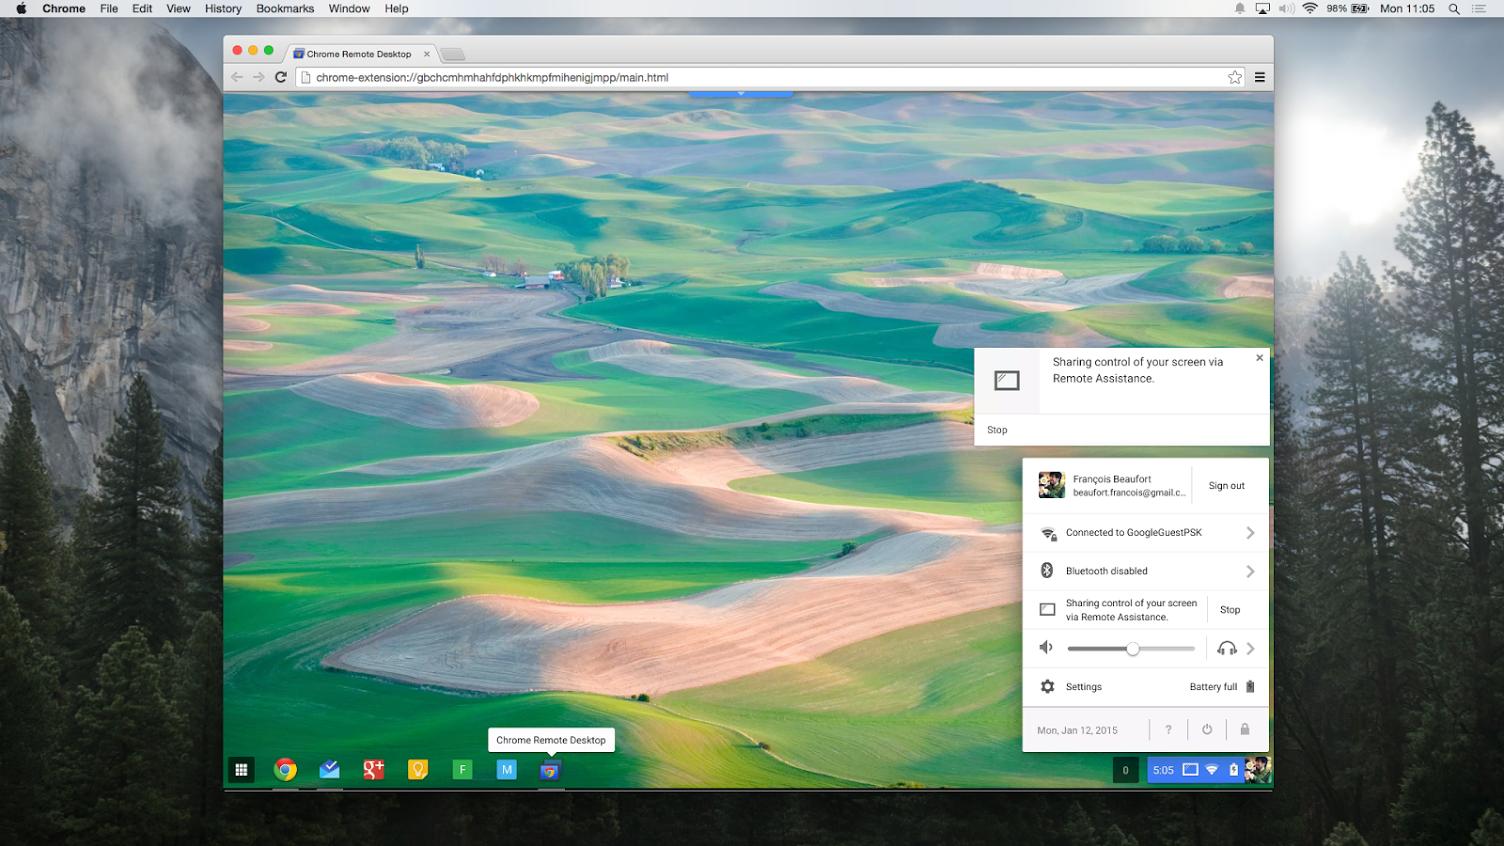 Google's bringing Remote Desktop sharing to Chrome OS | PCWorld